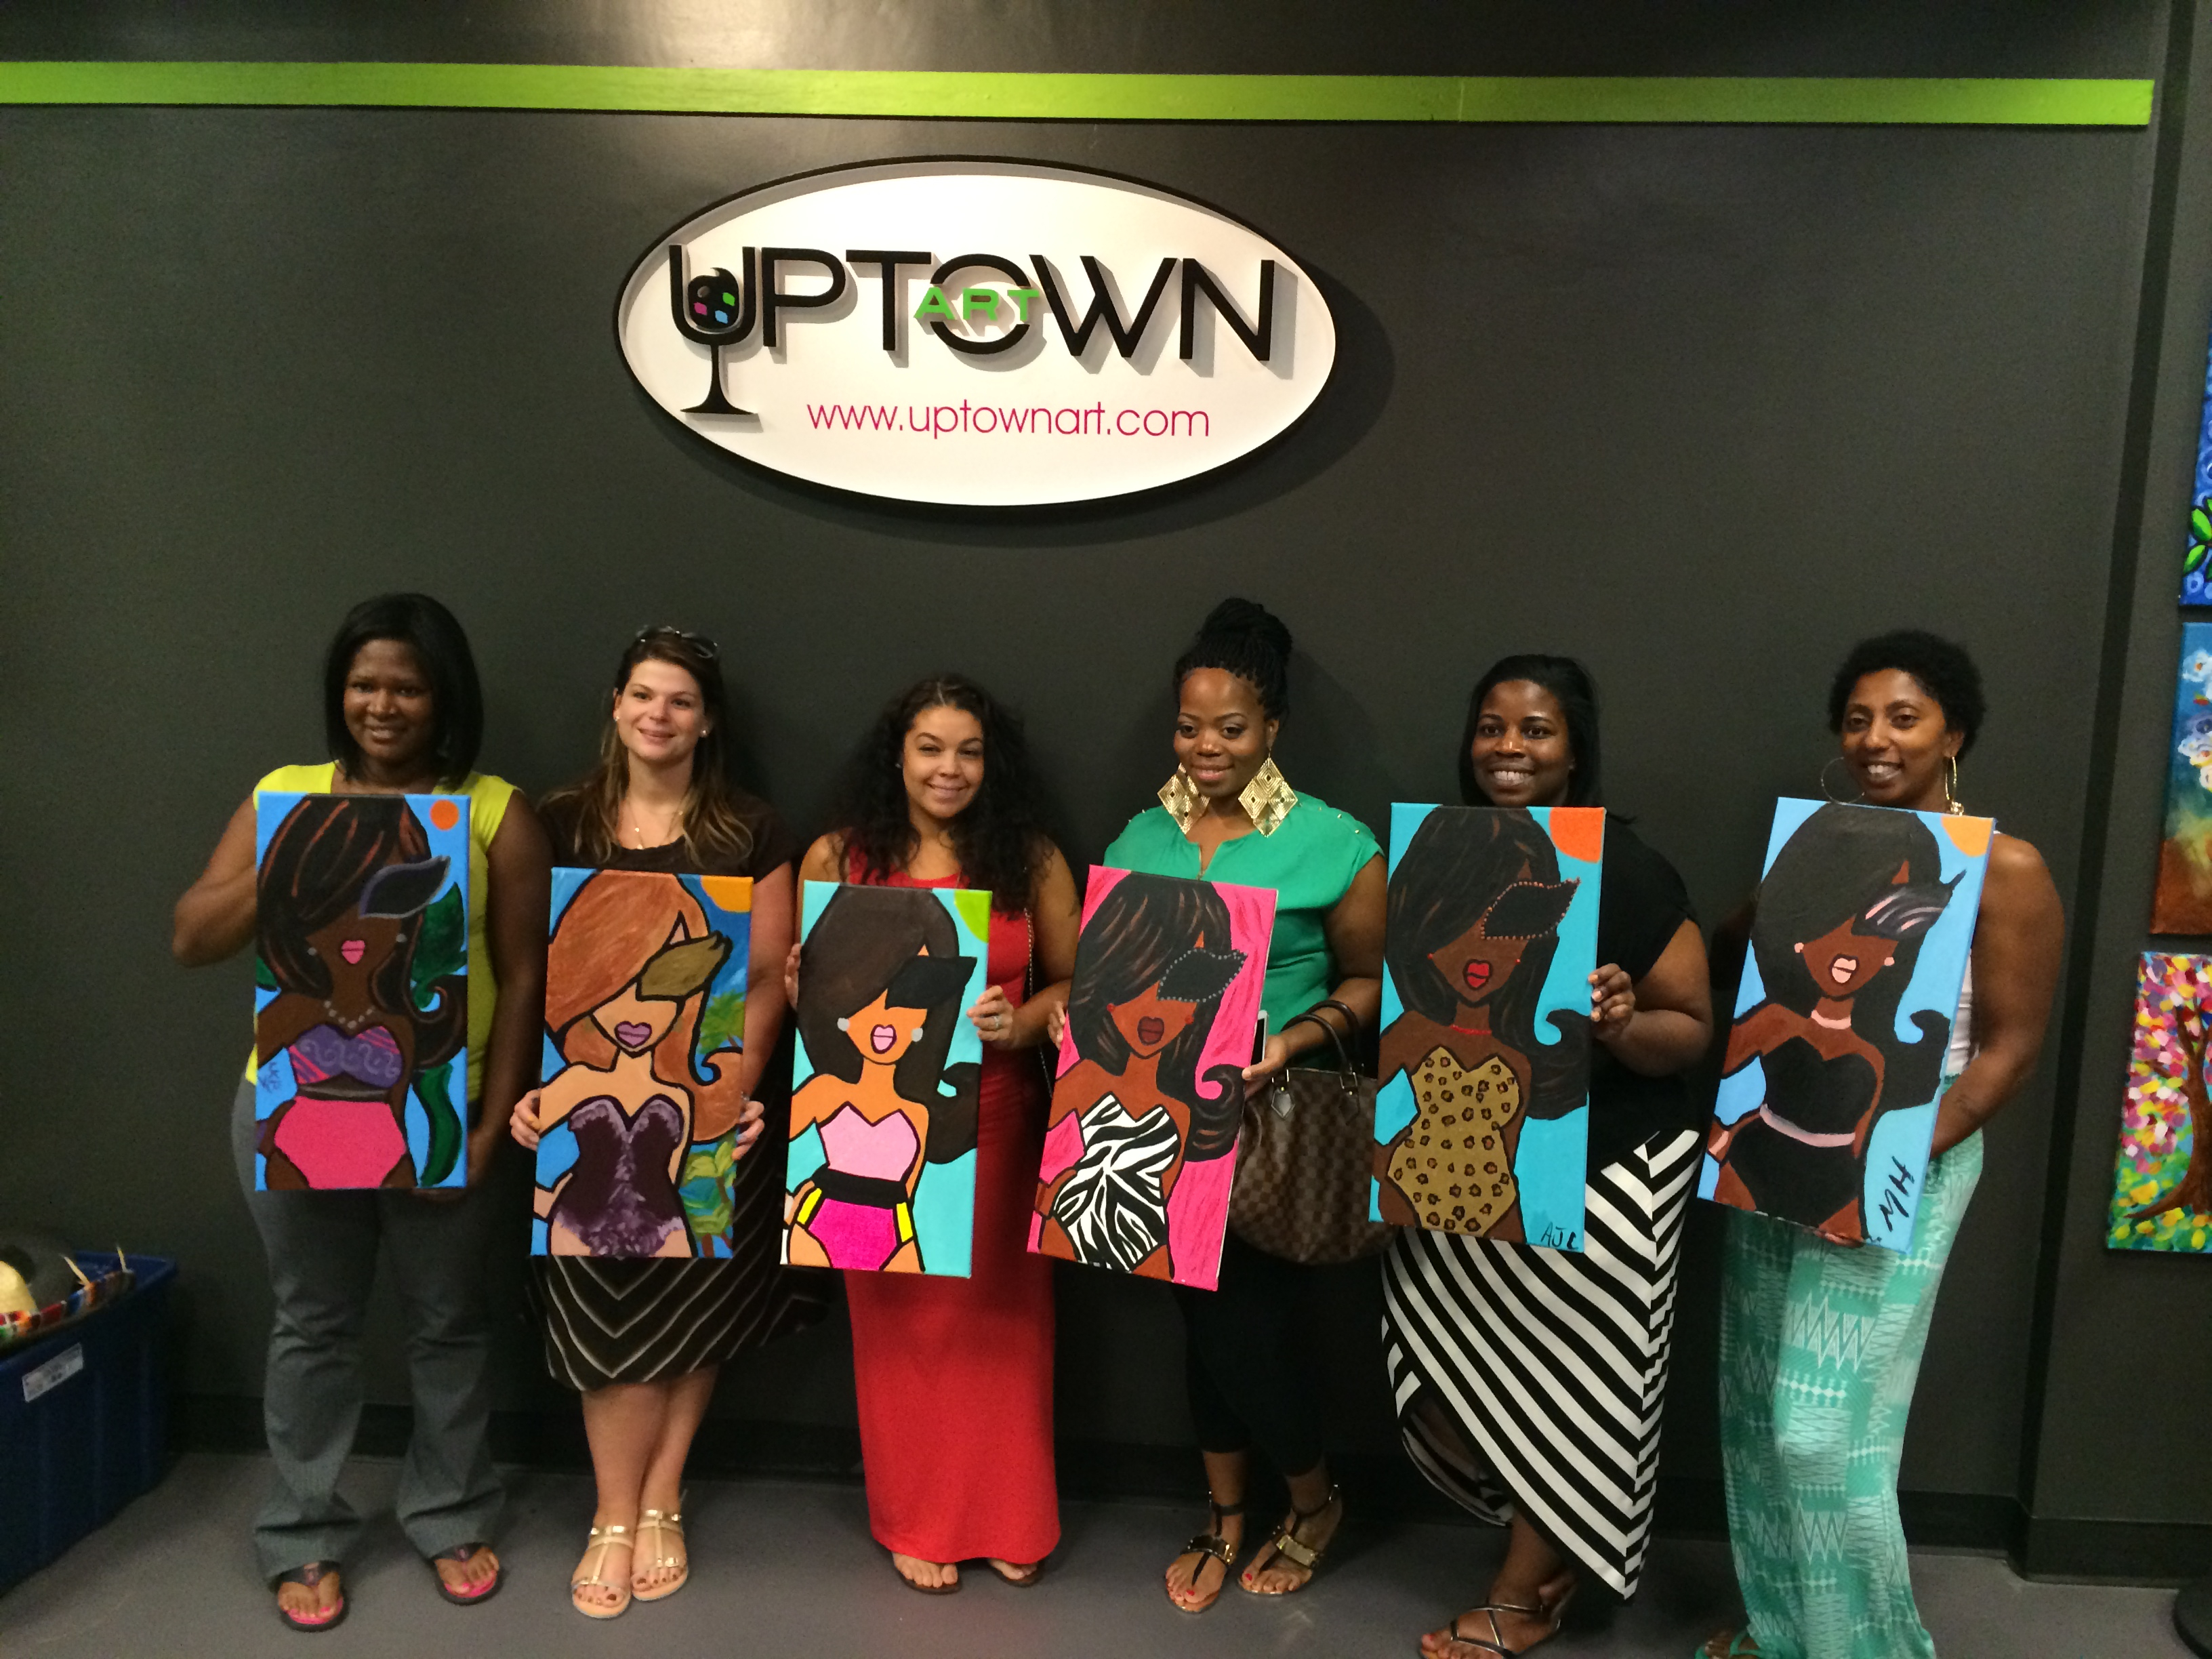 Twiggy Originals » Wine, Friends And Painting: A Twiggy In Uptown Art Louisville Calendar